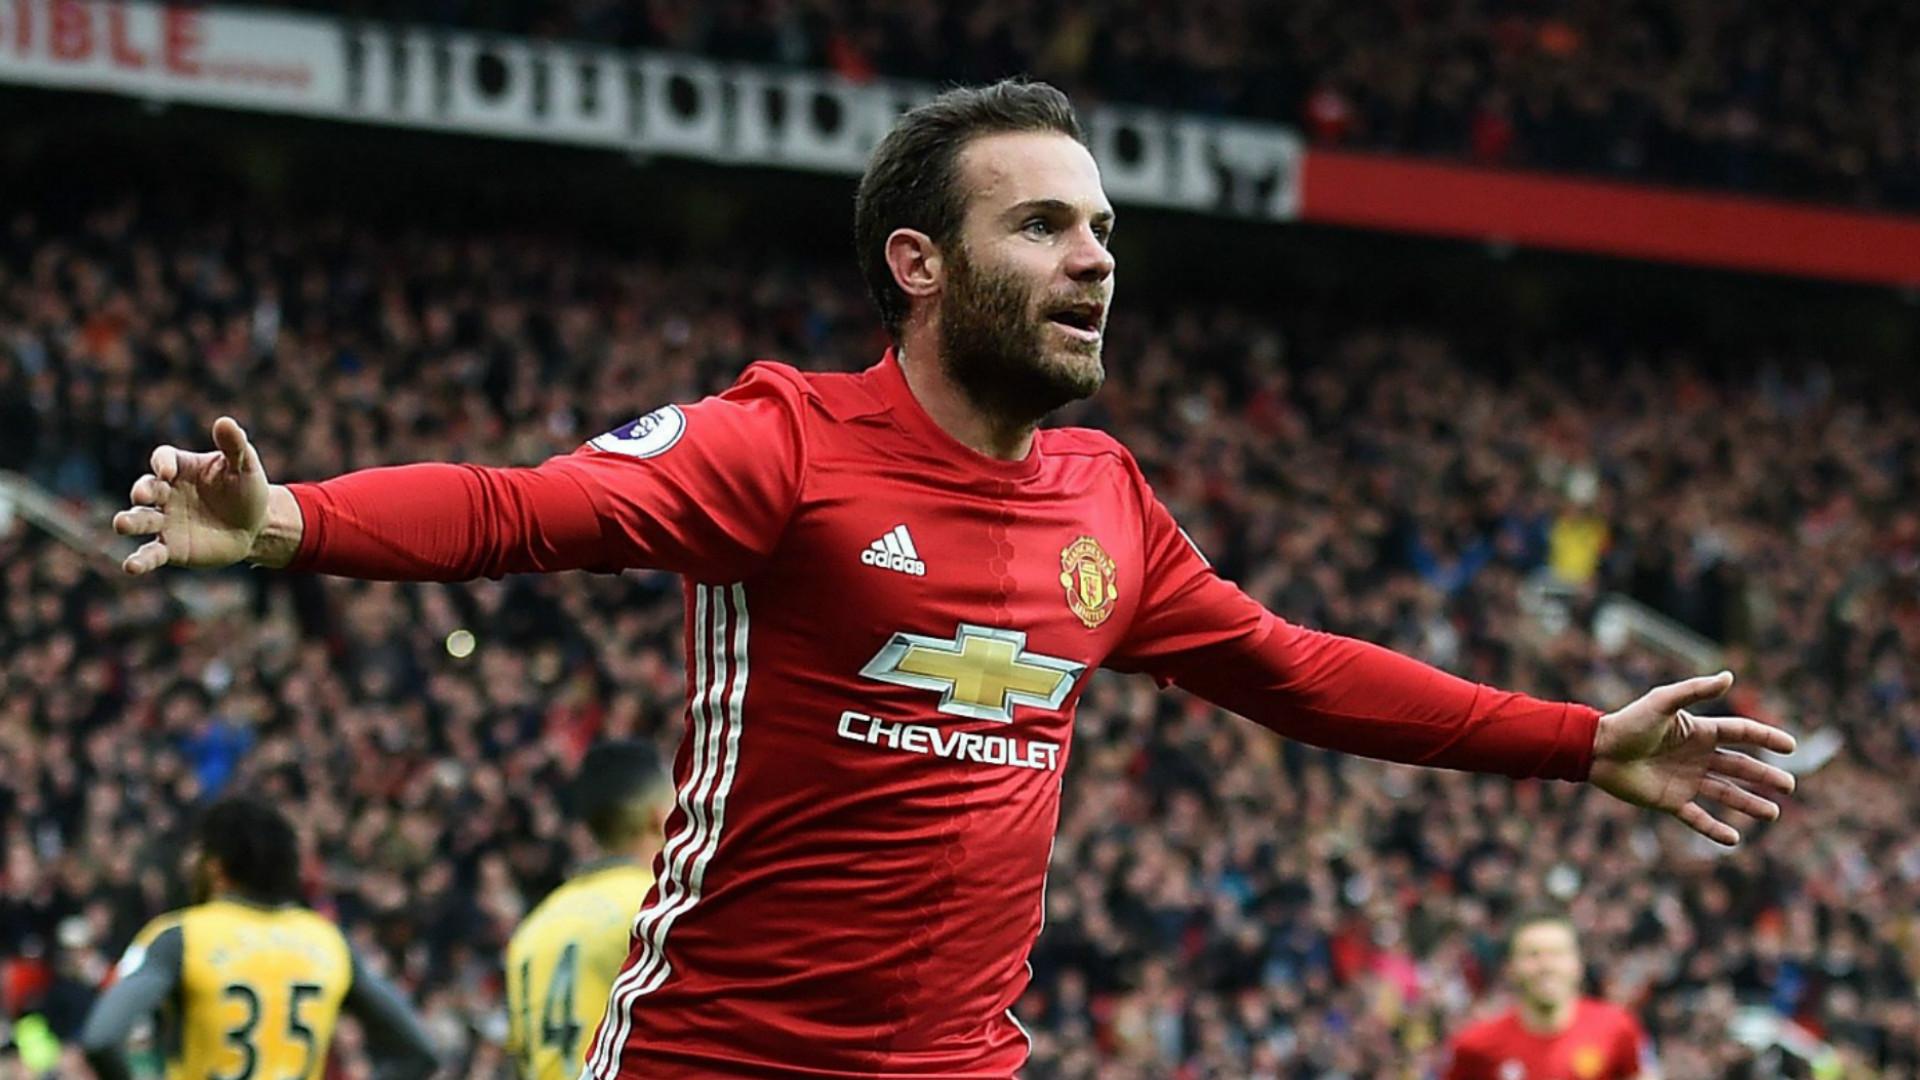 HD Juan Mata Manchester United